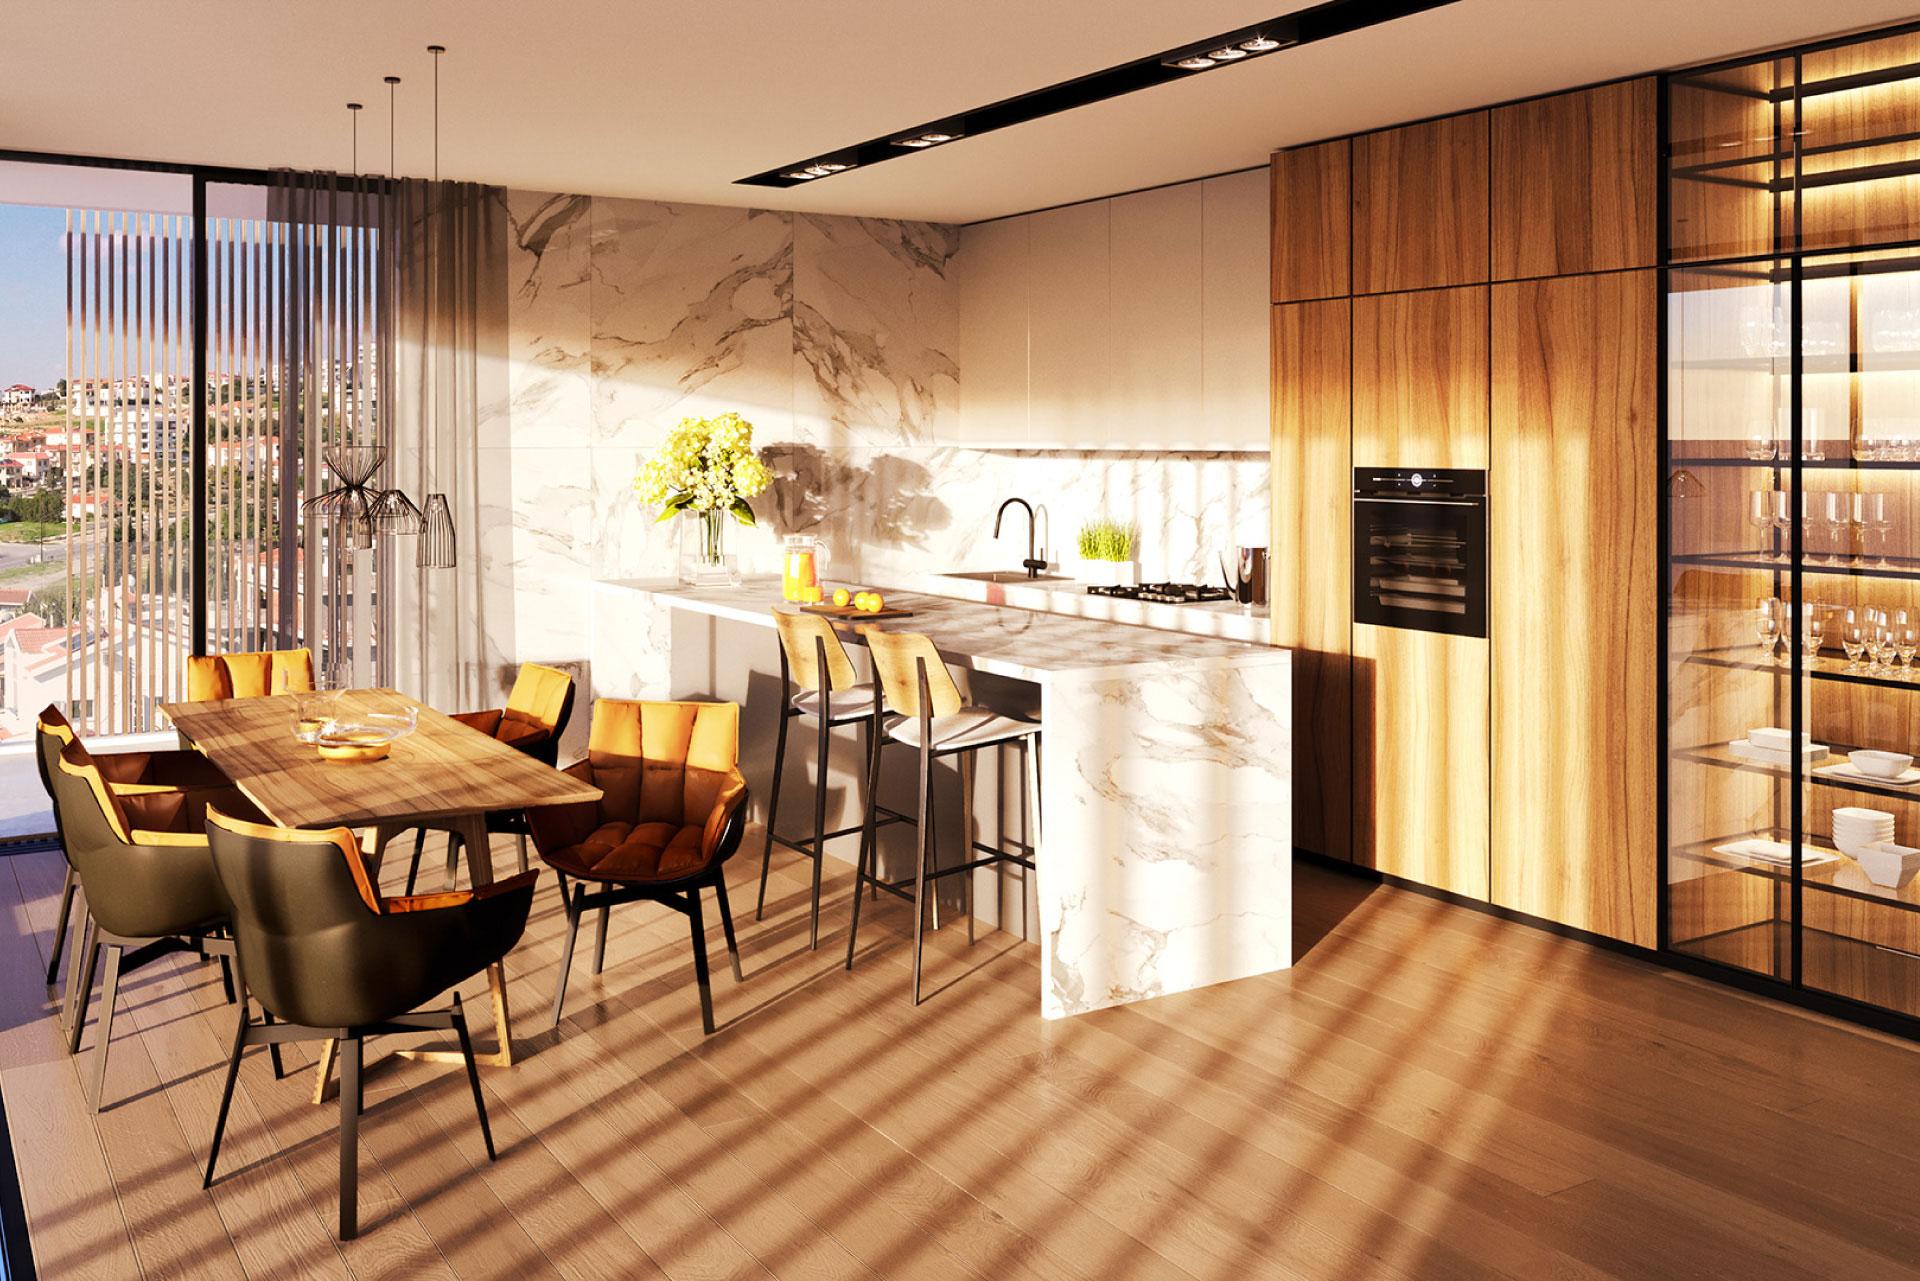 barbican, barbicanheights, imperioproperties, cyprus, limassol, properties, residences, properties